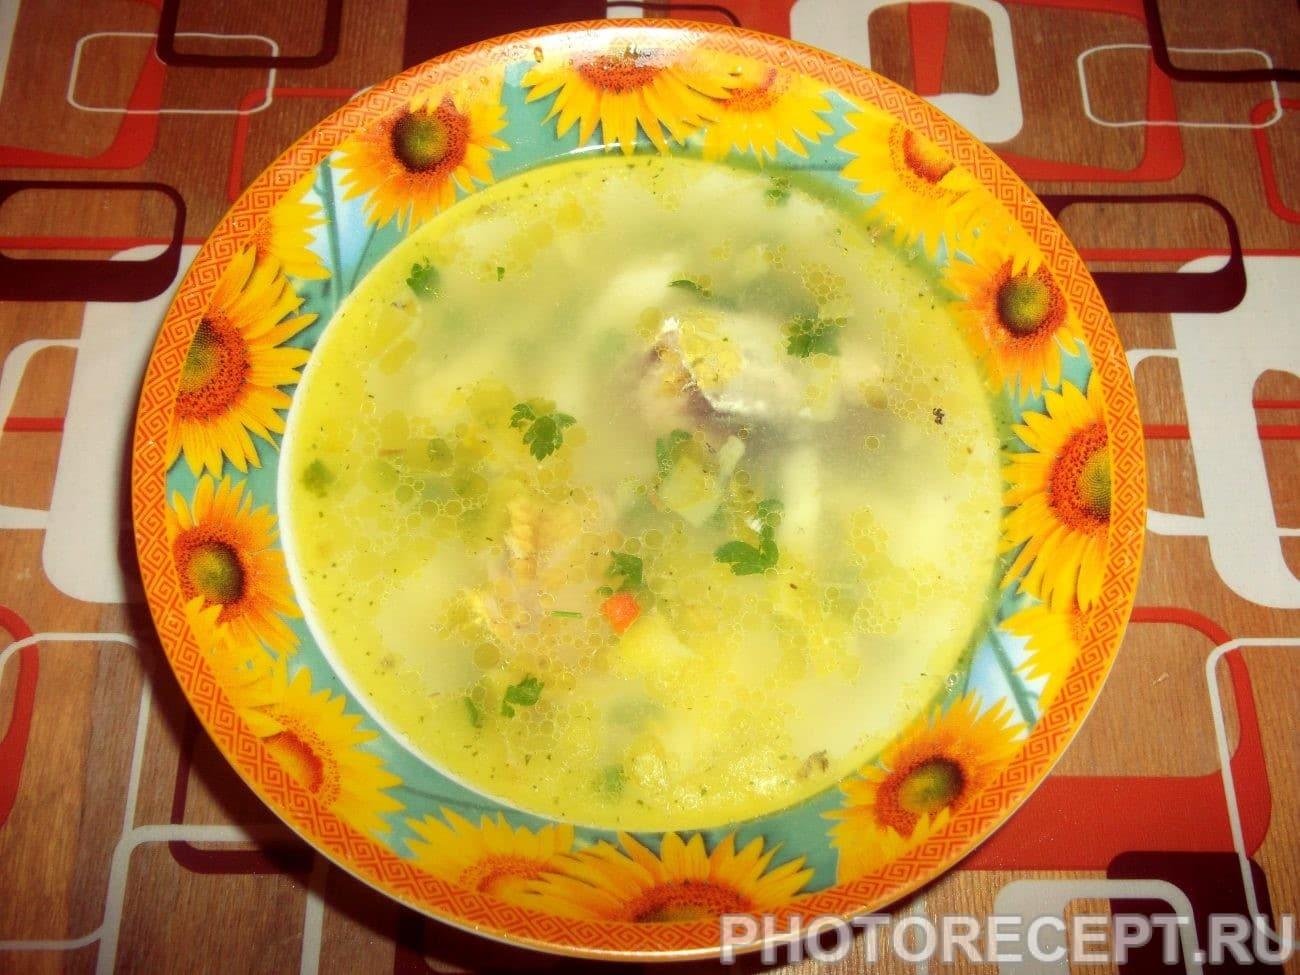 Суп из рыбы пошагово